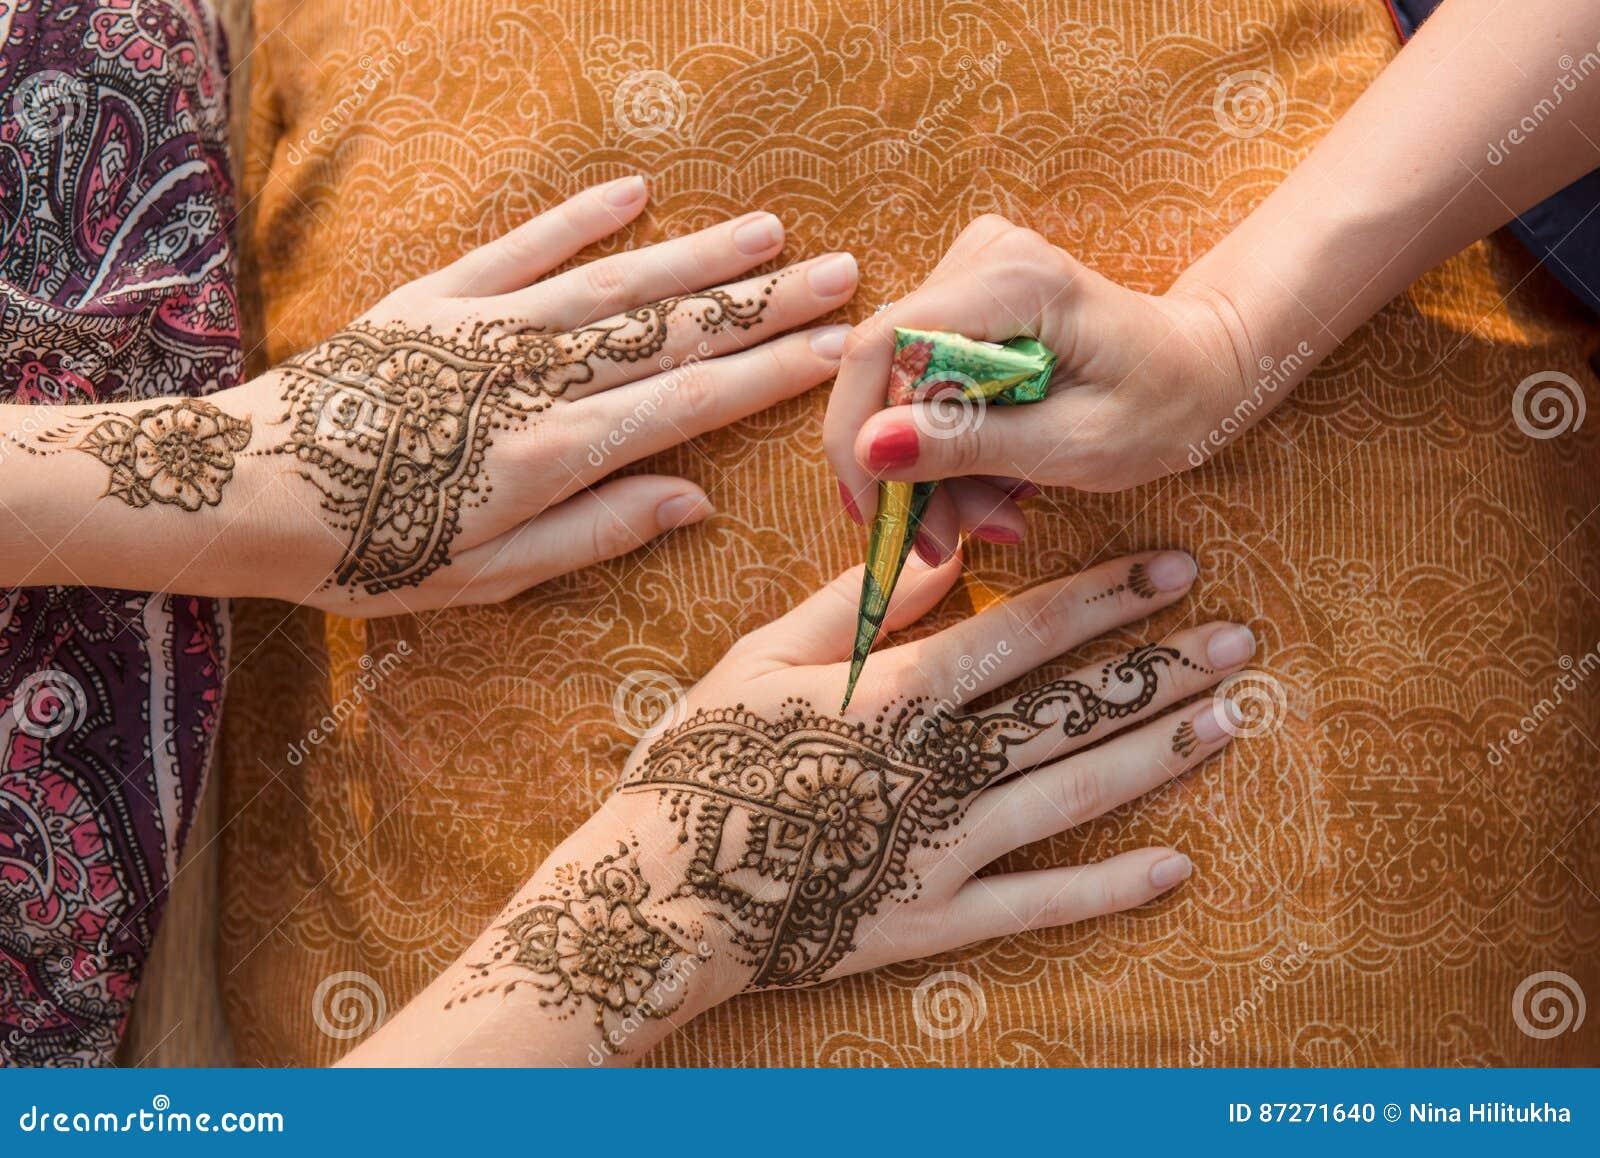 Applying Henna Tattoo On Women Hands Stock Photo , Image of